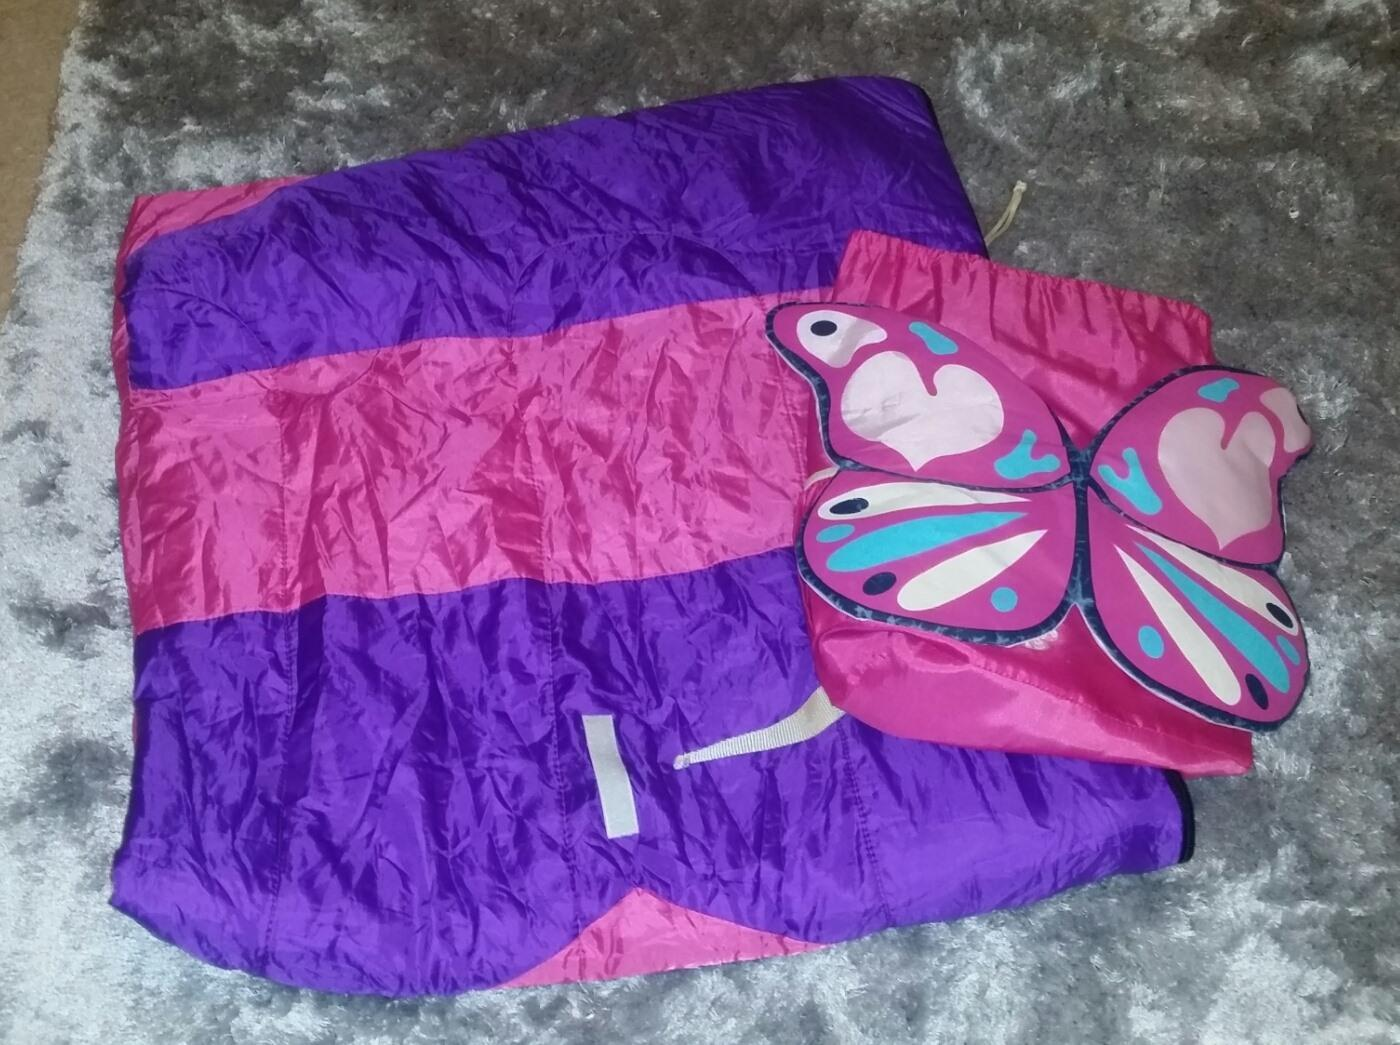 Girl's Pink Camping Slumber Sleeping Bag w/ Removable